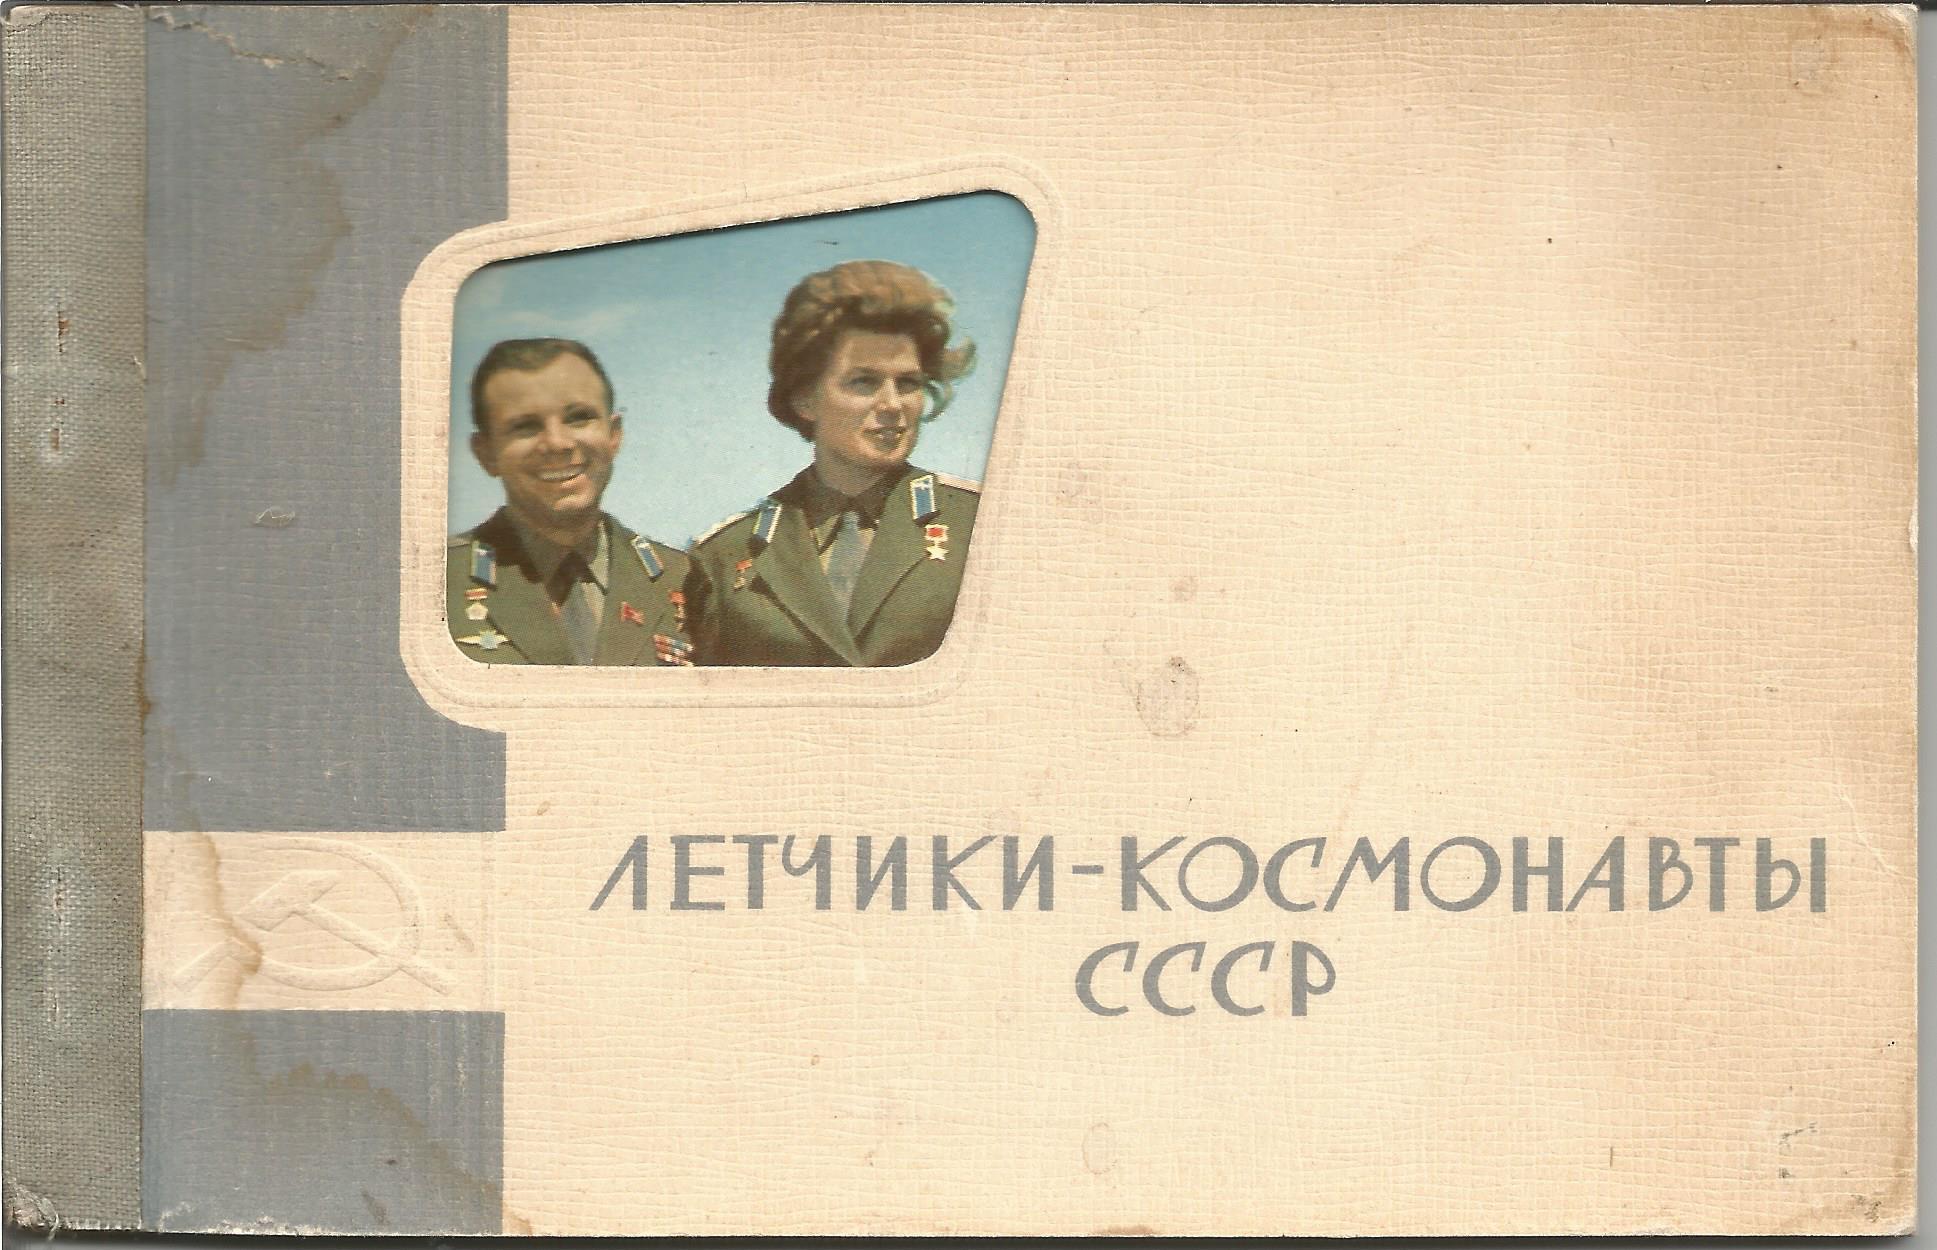 Valery Bykovsky signed Vintage Russian Cosmonauts picture postcard book. Bykovsky was a Soviet - Image 3 of 3